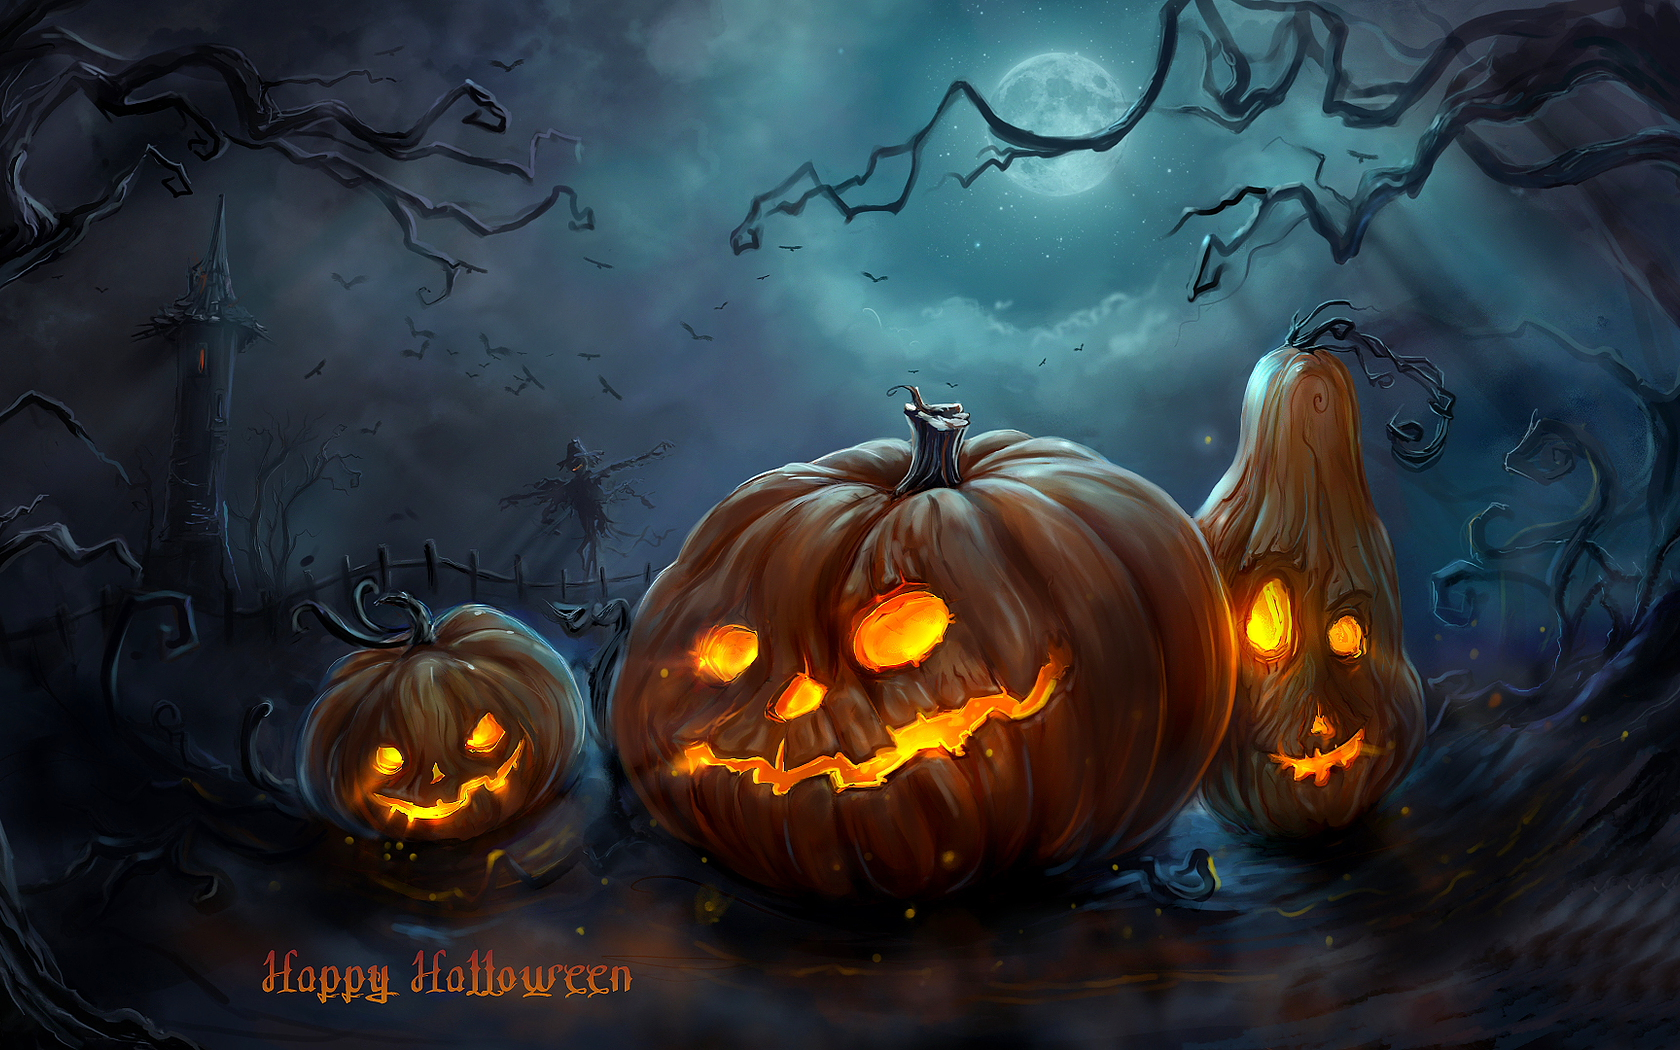 Index of /catalog/view/theme/halloween/image/halloween